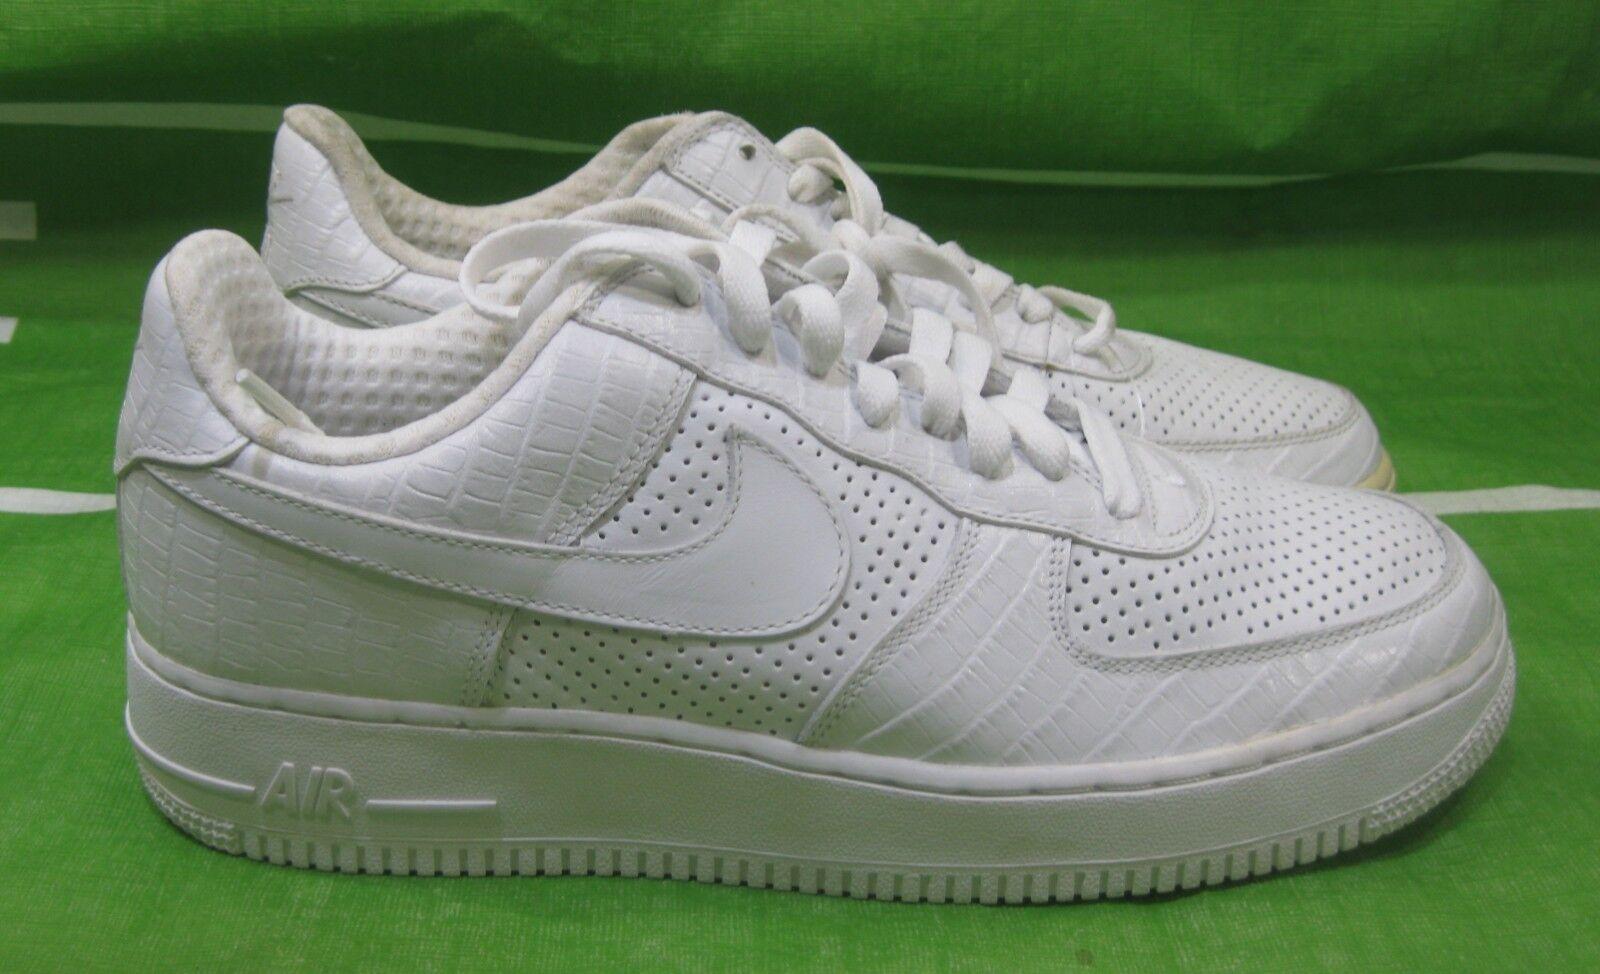 Nike Air Force 1 premium White Crocodile Pelle 309096-112 Taglia 9.5